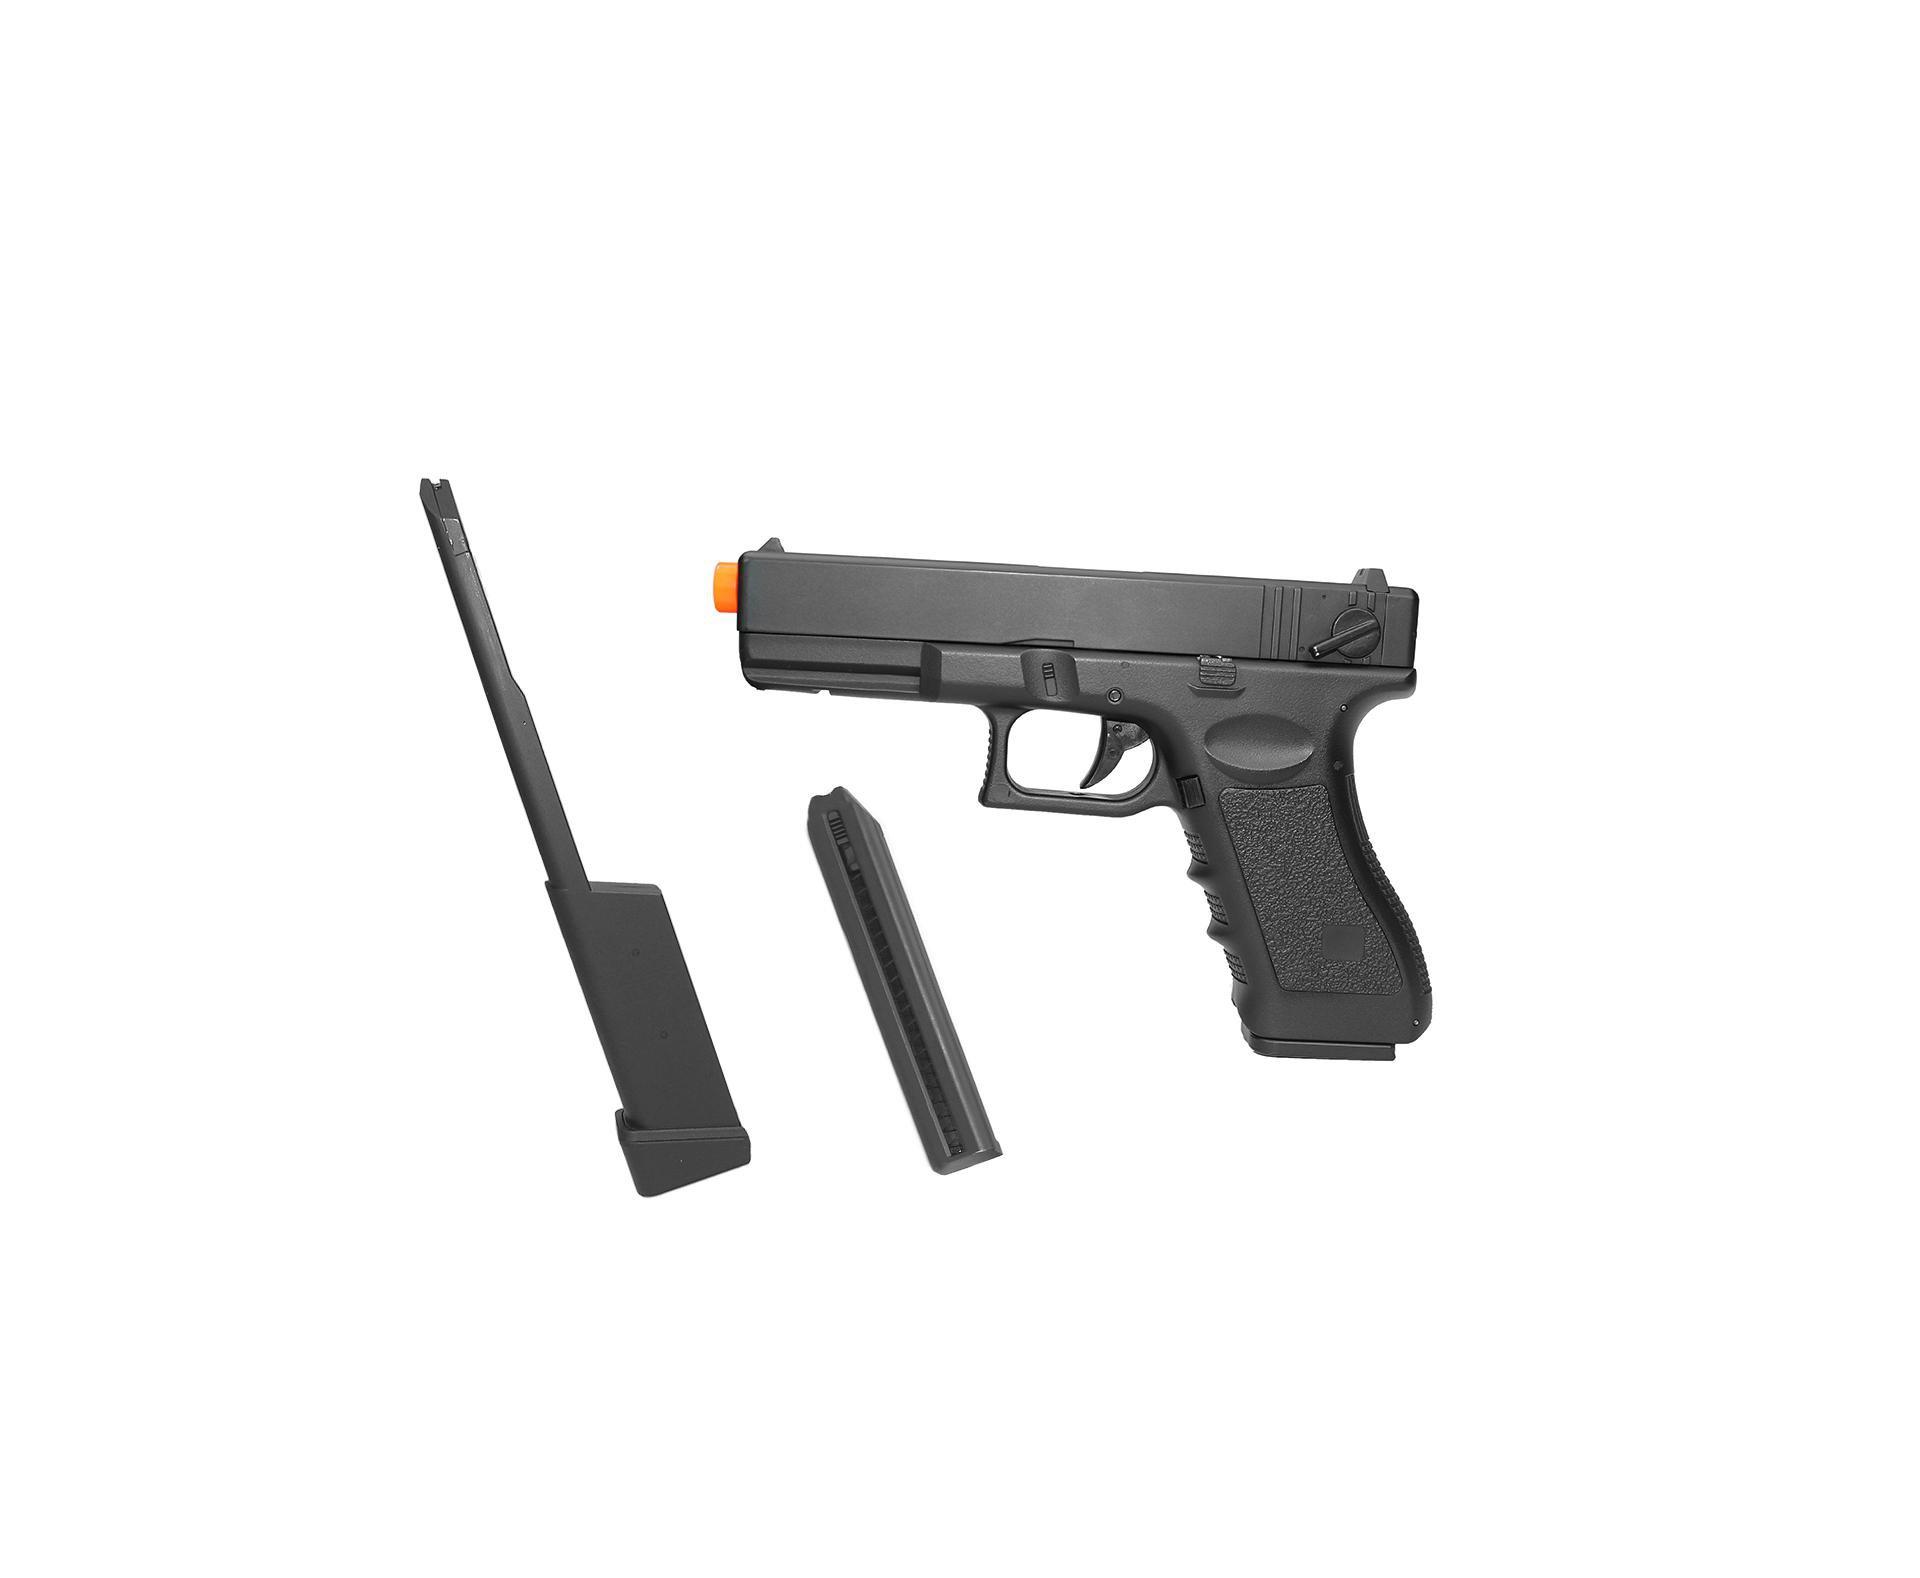 Pistola De Airsoft Eletrica Glock G18c + Magazine Estendido + Case Deluxe - Calibre 6,0 Mm - Cyma